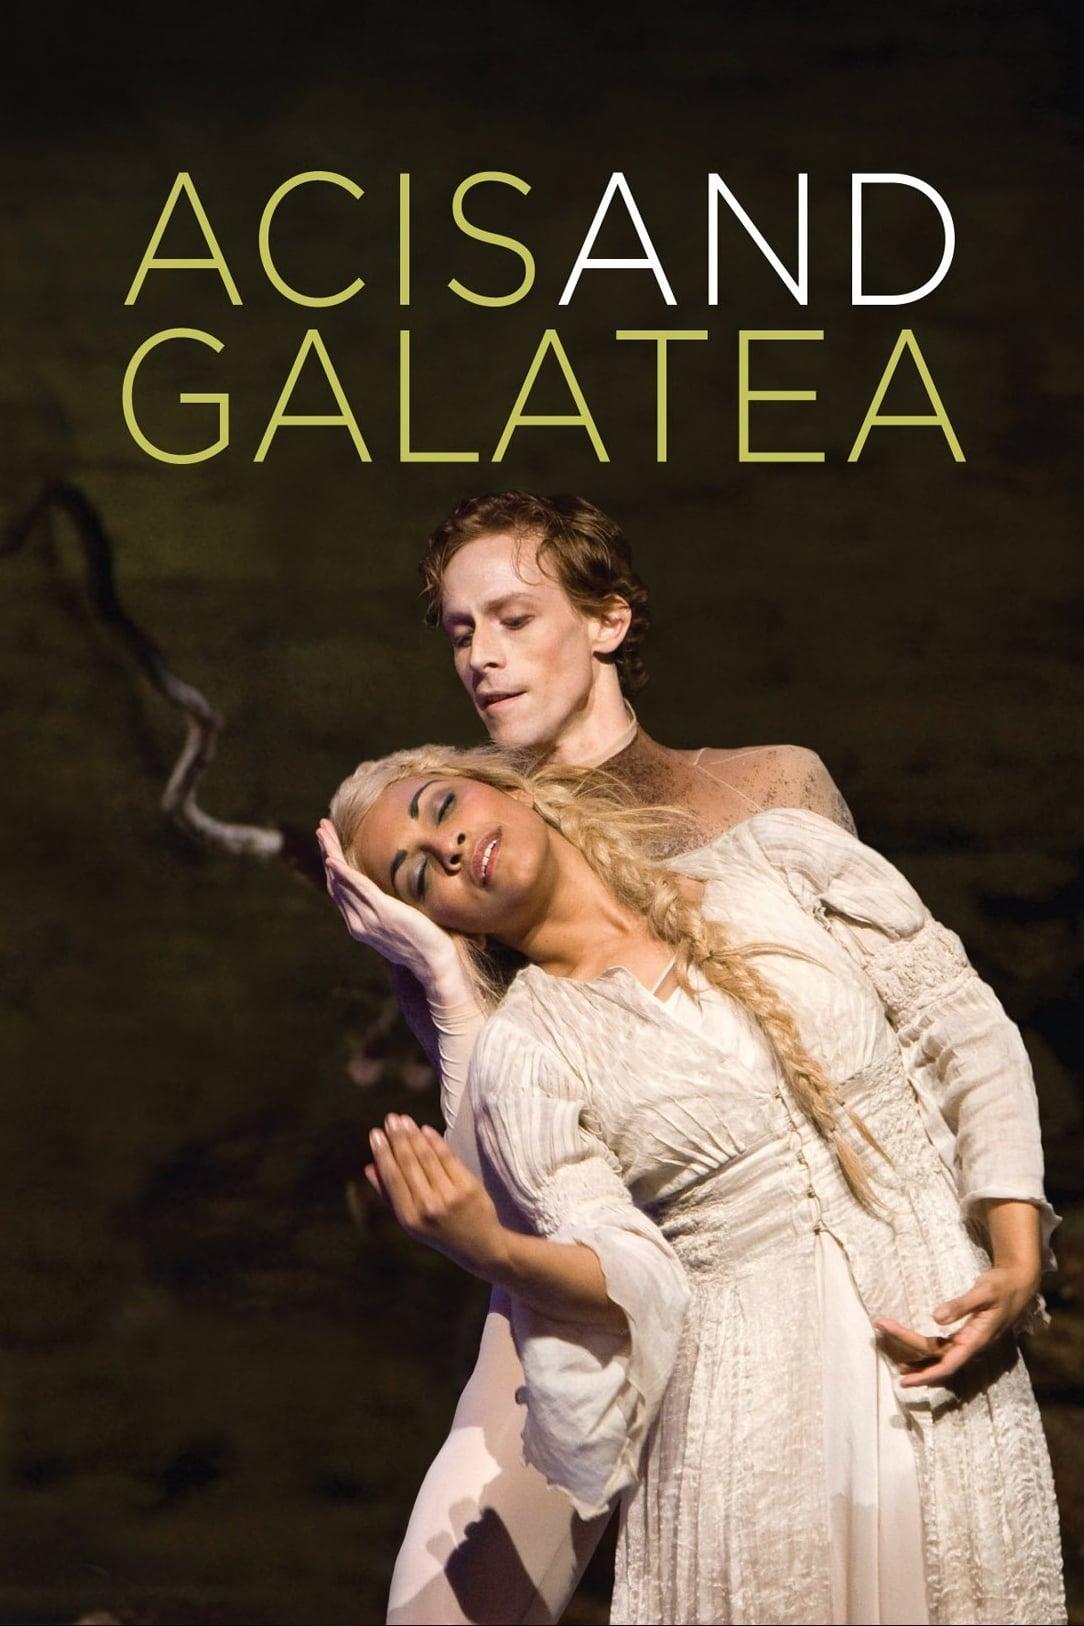 Acis and Galatea (The Royal Ballet / The Royal Opera)